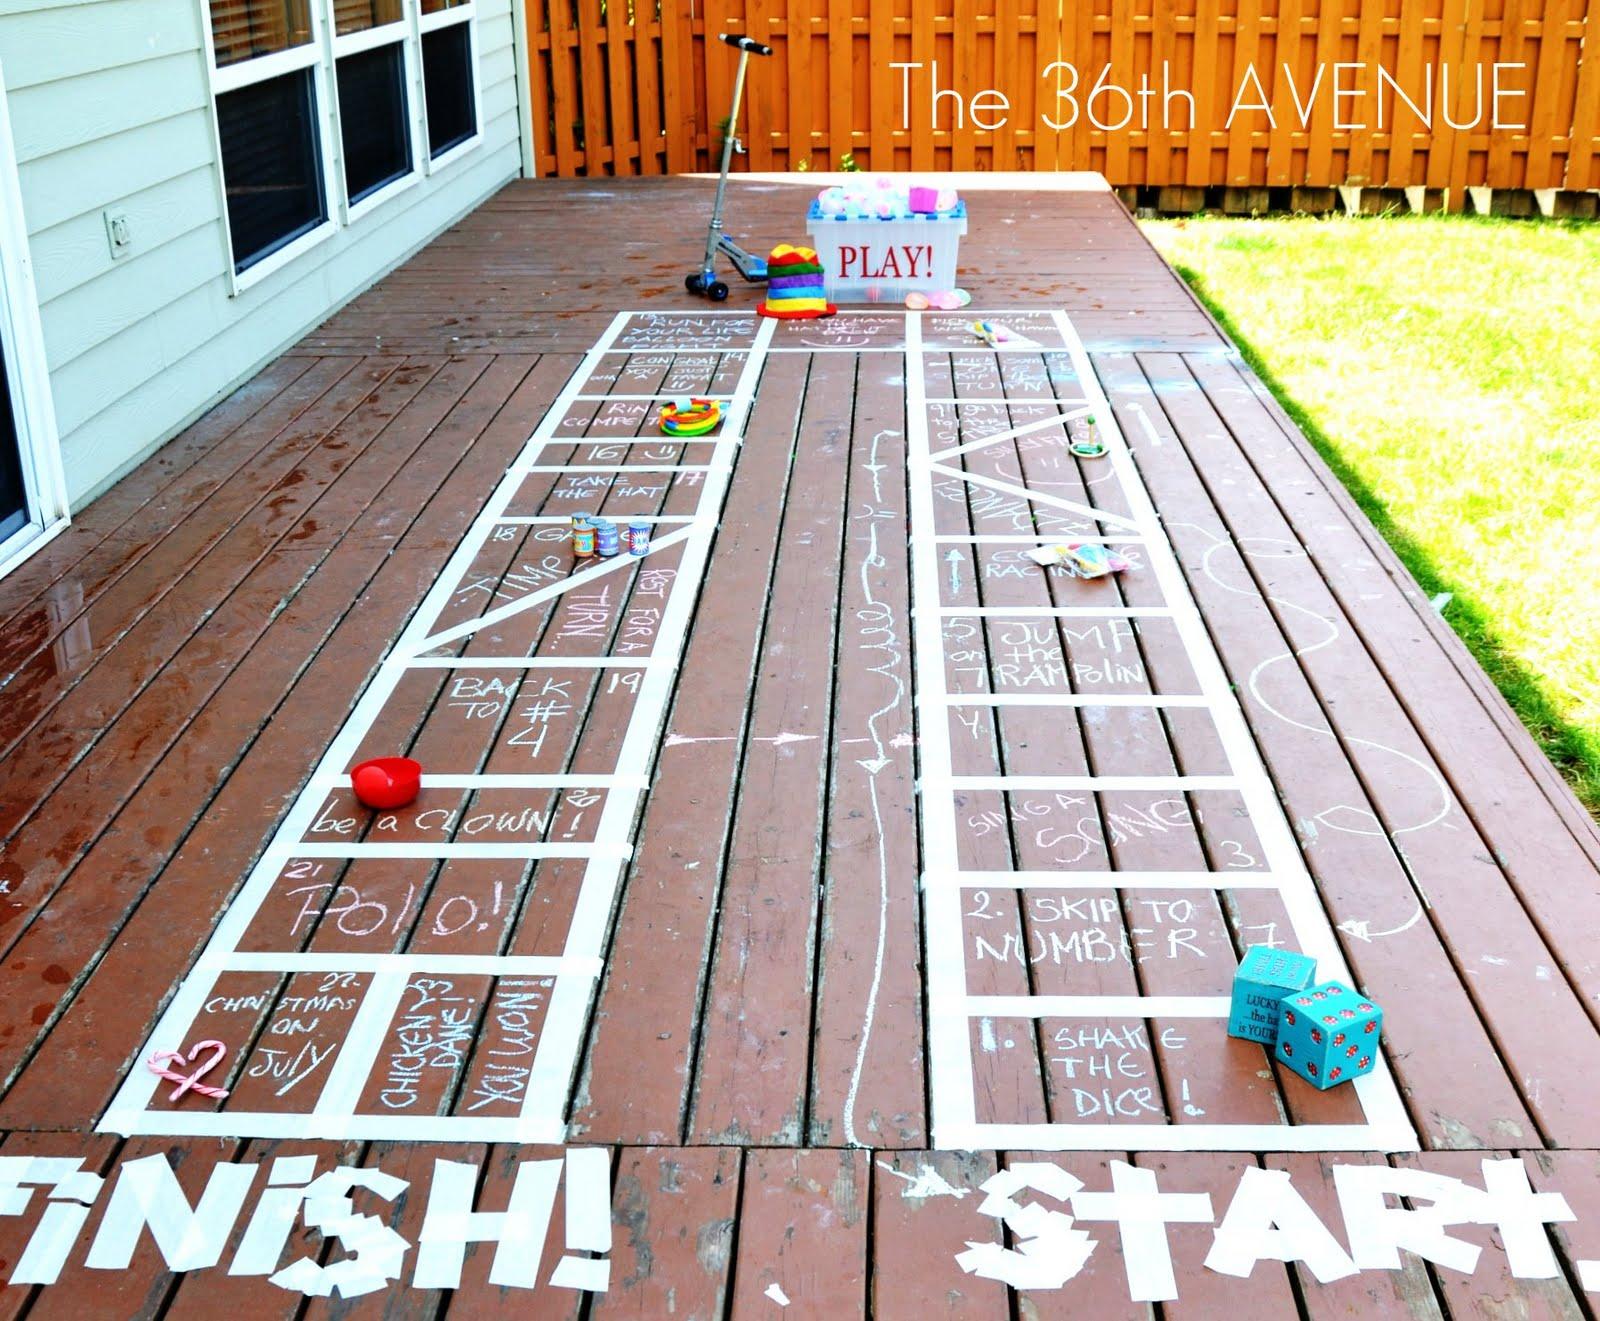 f166fa48 Kid Activities - Backyard Giant Game Board - The 36th AVENUE